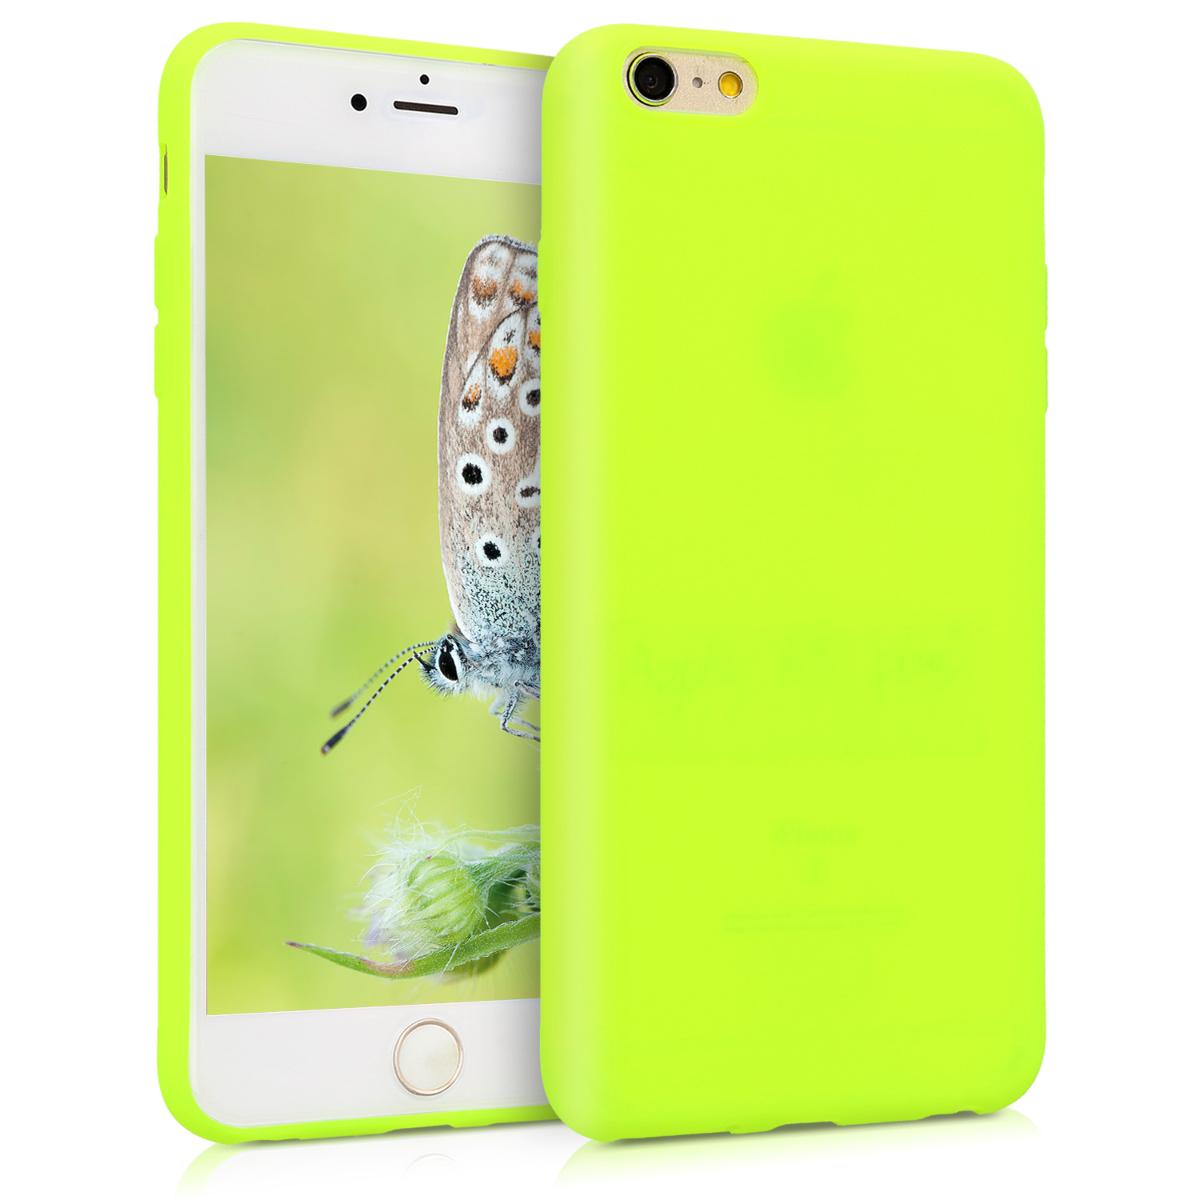 Kvalitní silikonové TPU pouzdro pro Apple iPhone 6 Plus / 6S - Neon Yellow